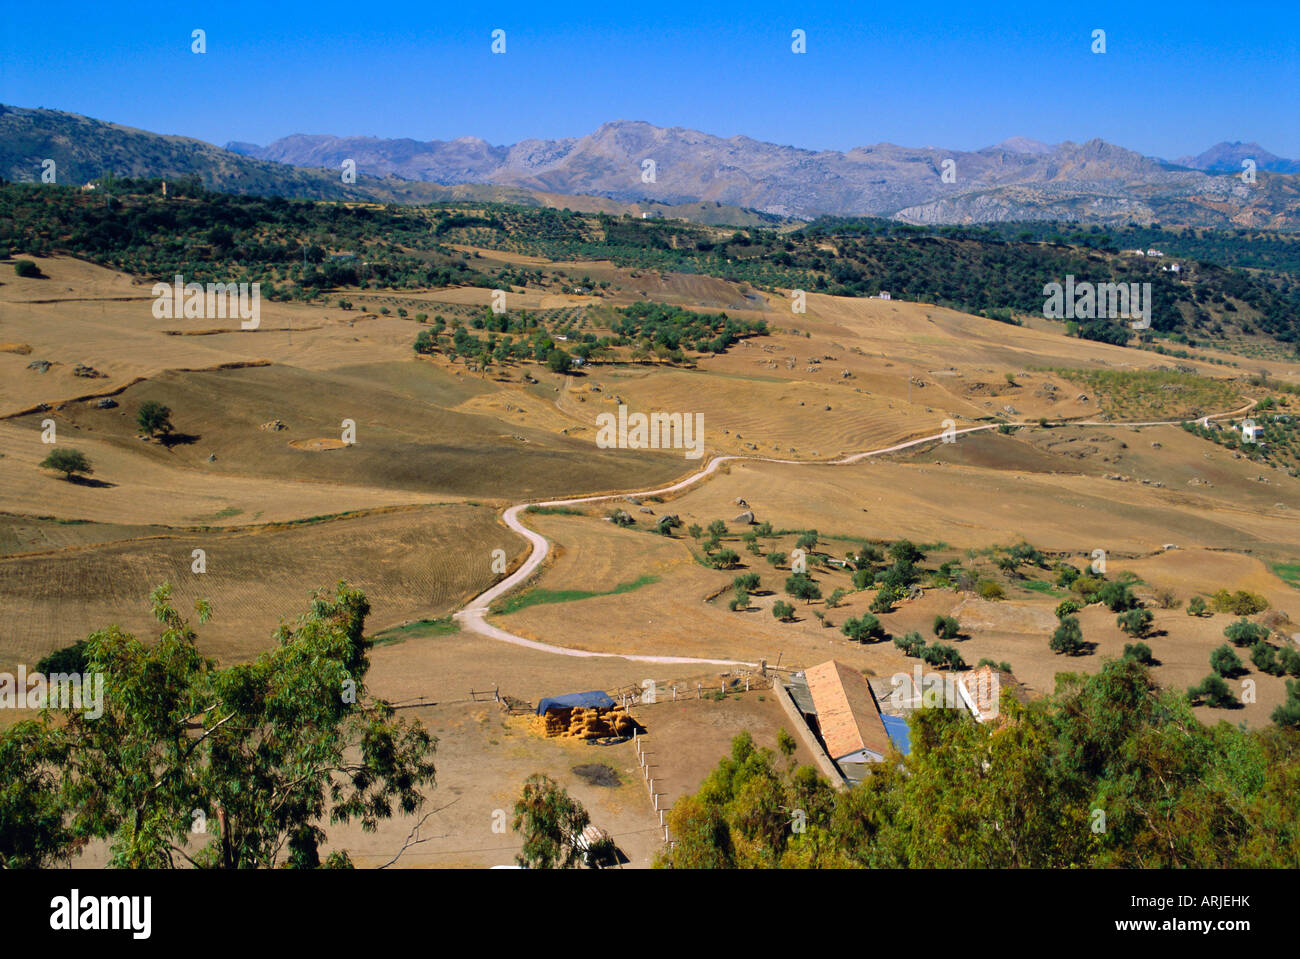 The Serrania de Ronda, Ronda, Andalucia, Spain, Europe - Stock Image